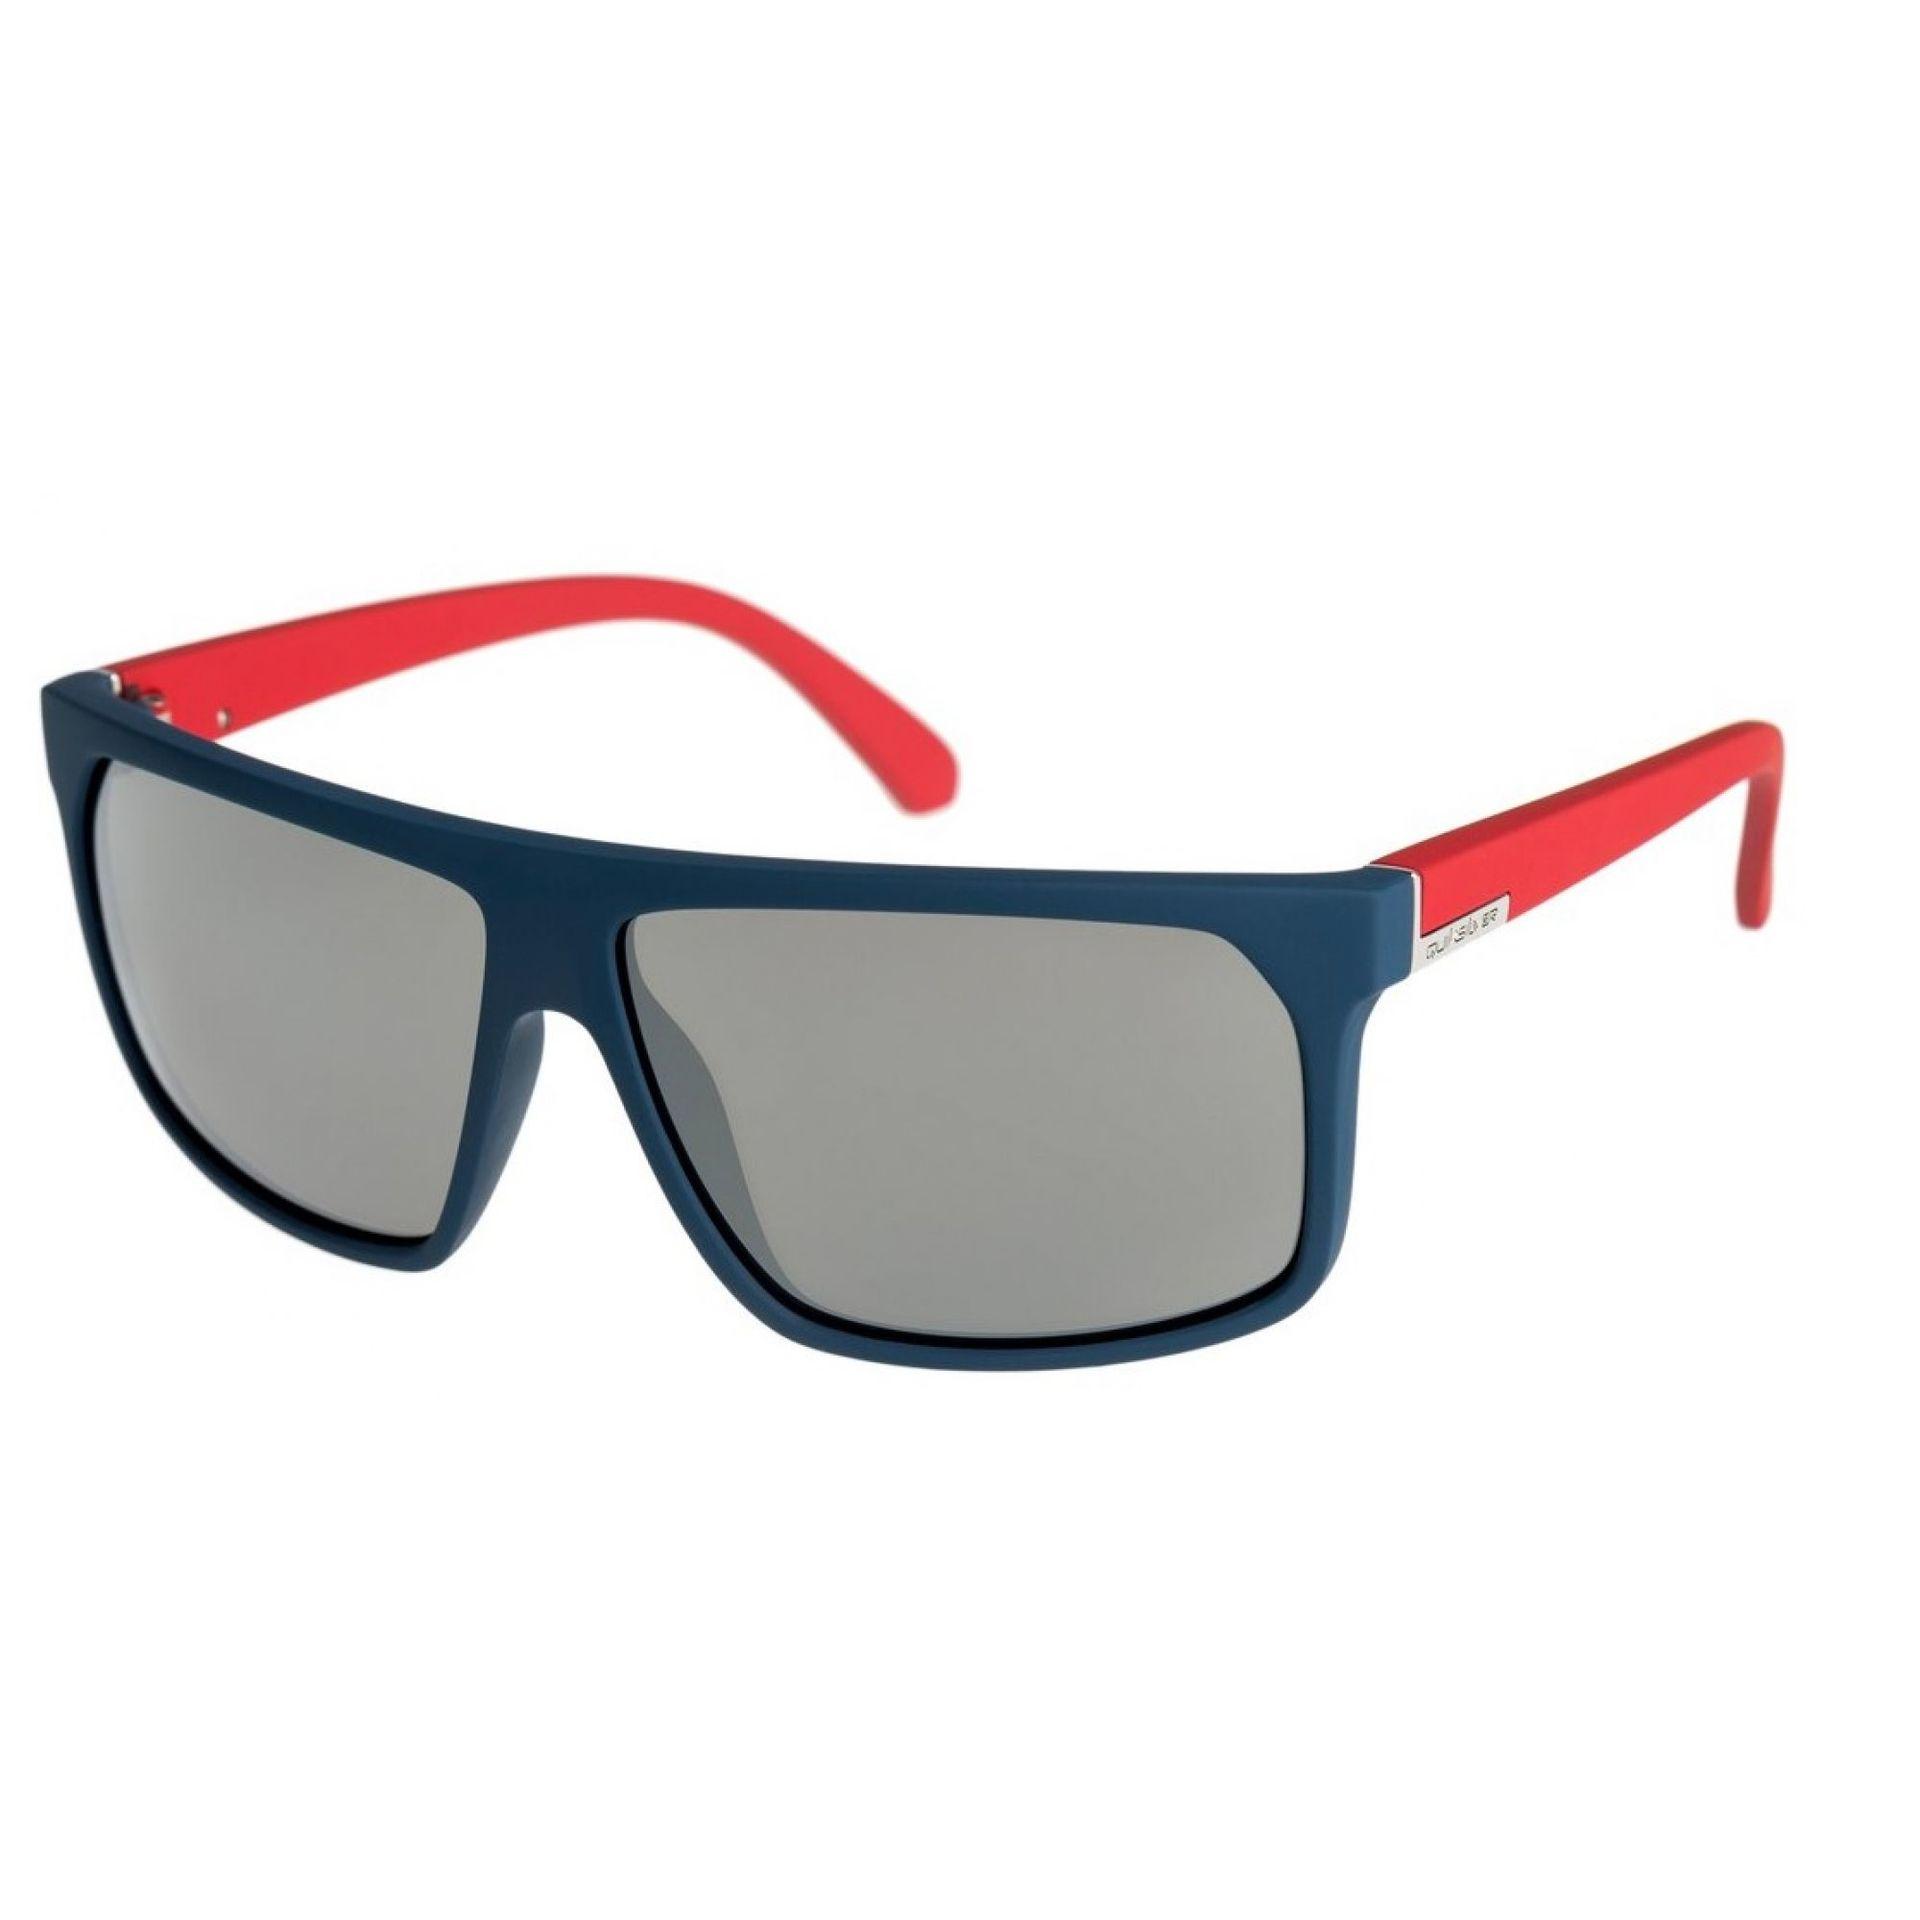 Okulary Quiksilver Moonwalker czerwony